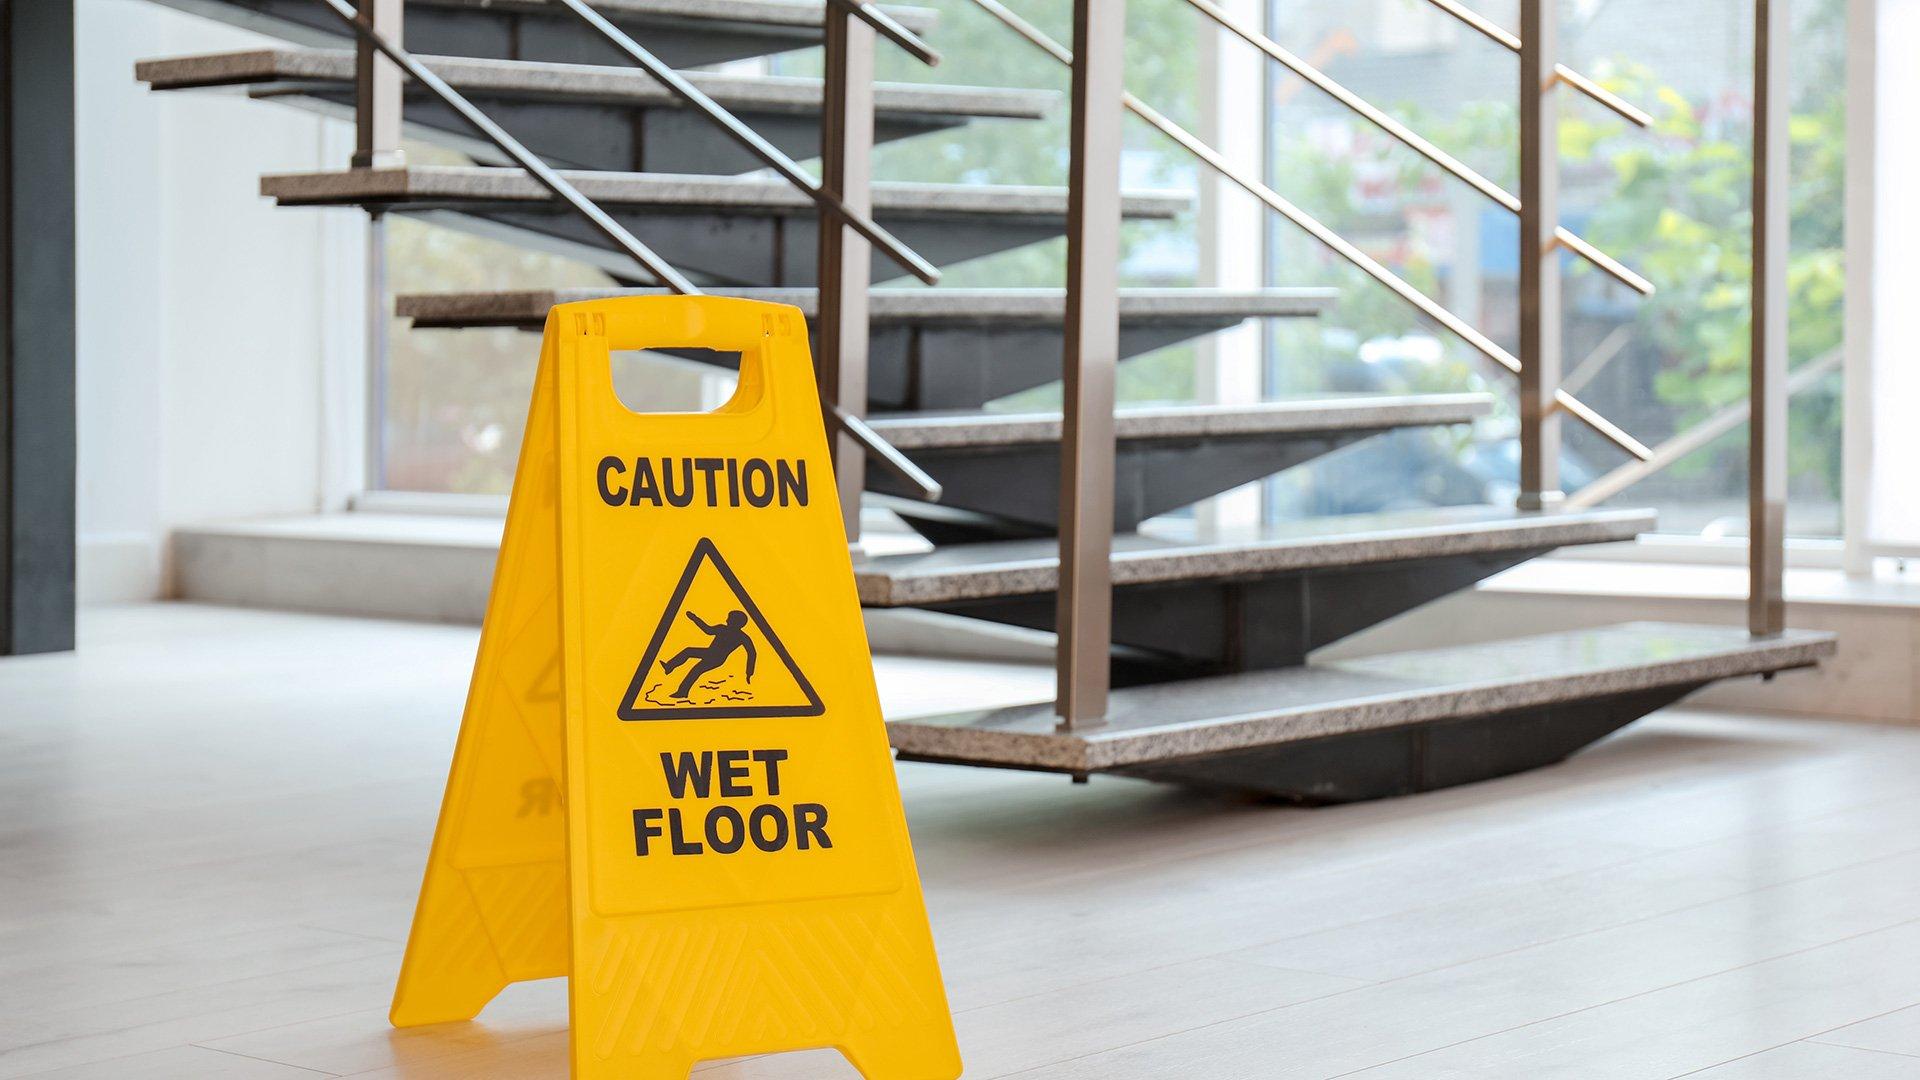 Pictured: Caution Wet Floor Sign